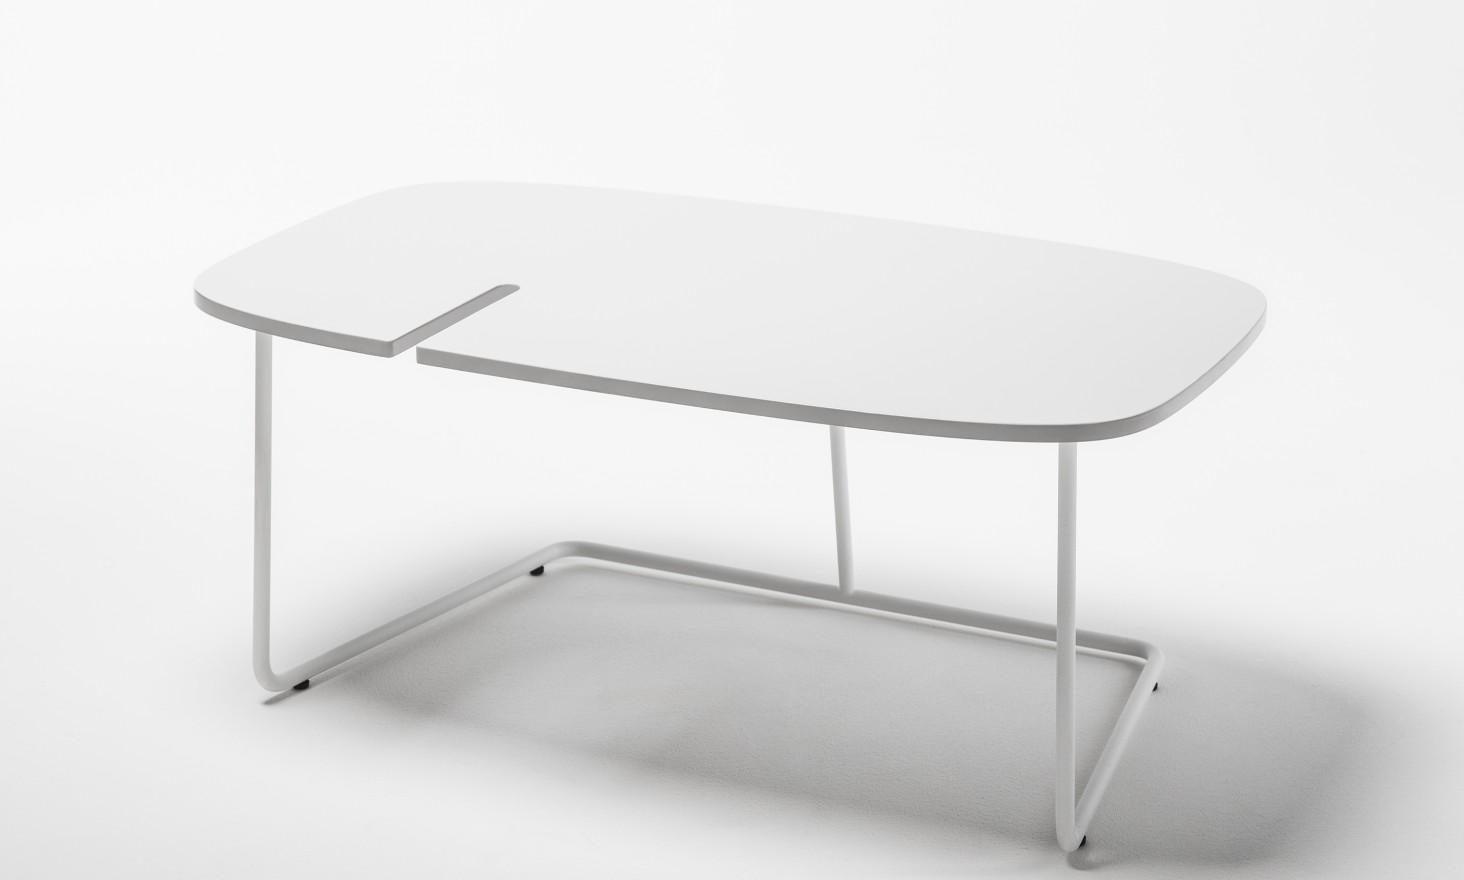 TEDDY_BEAR_packshot_table